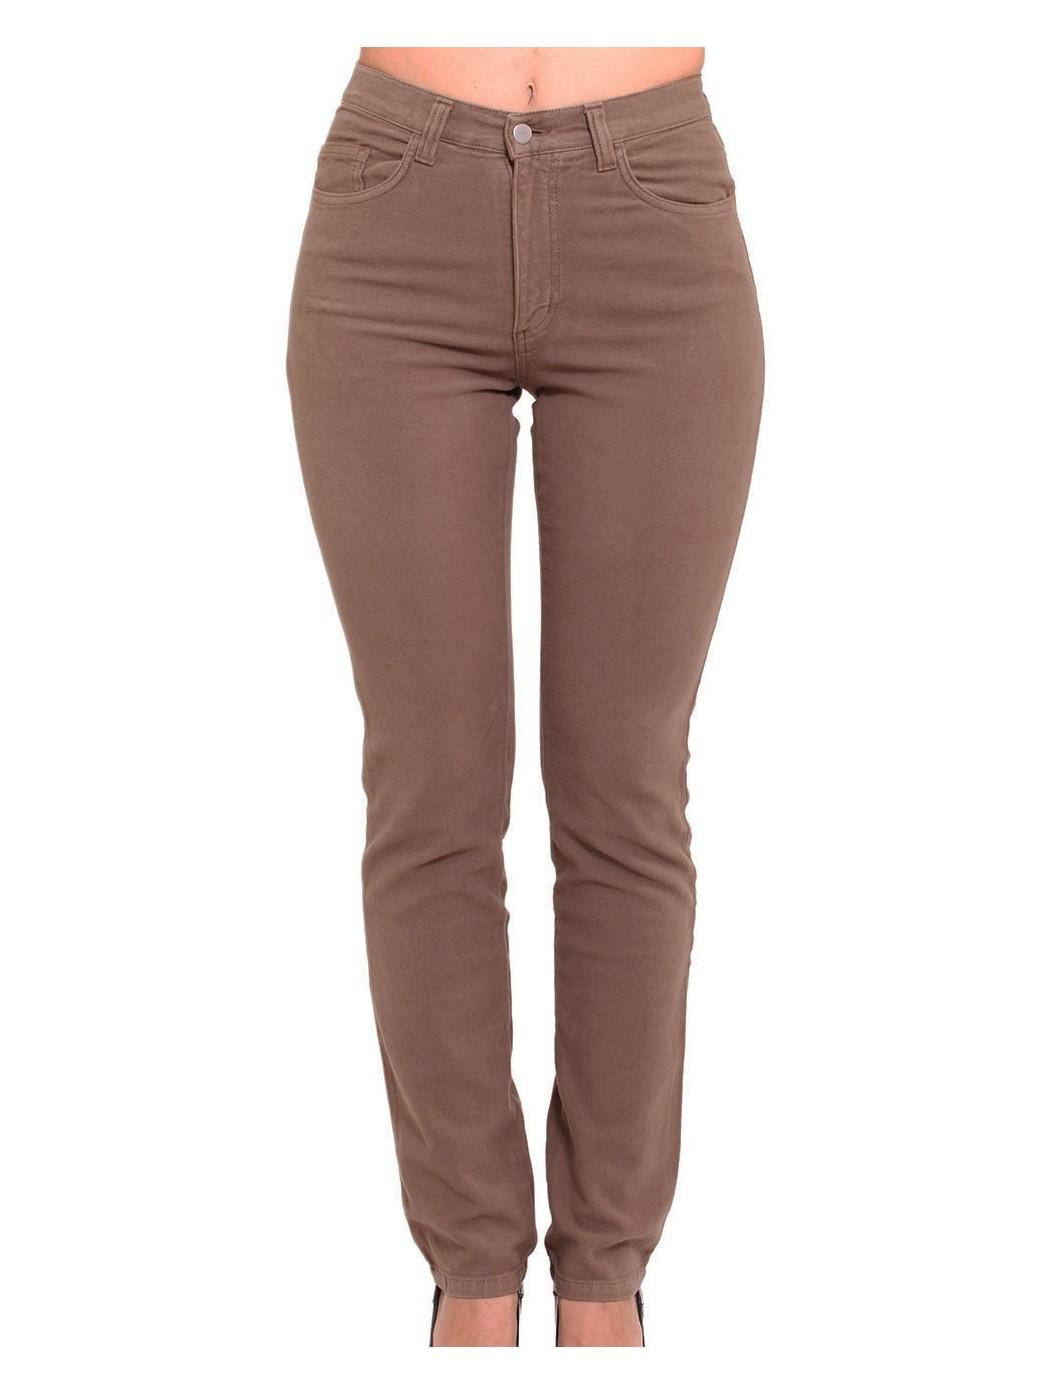 Musetti trousers